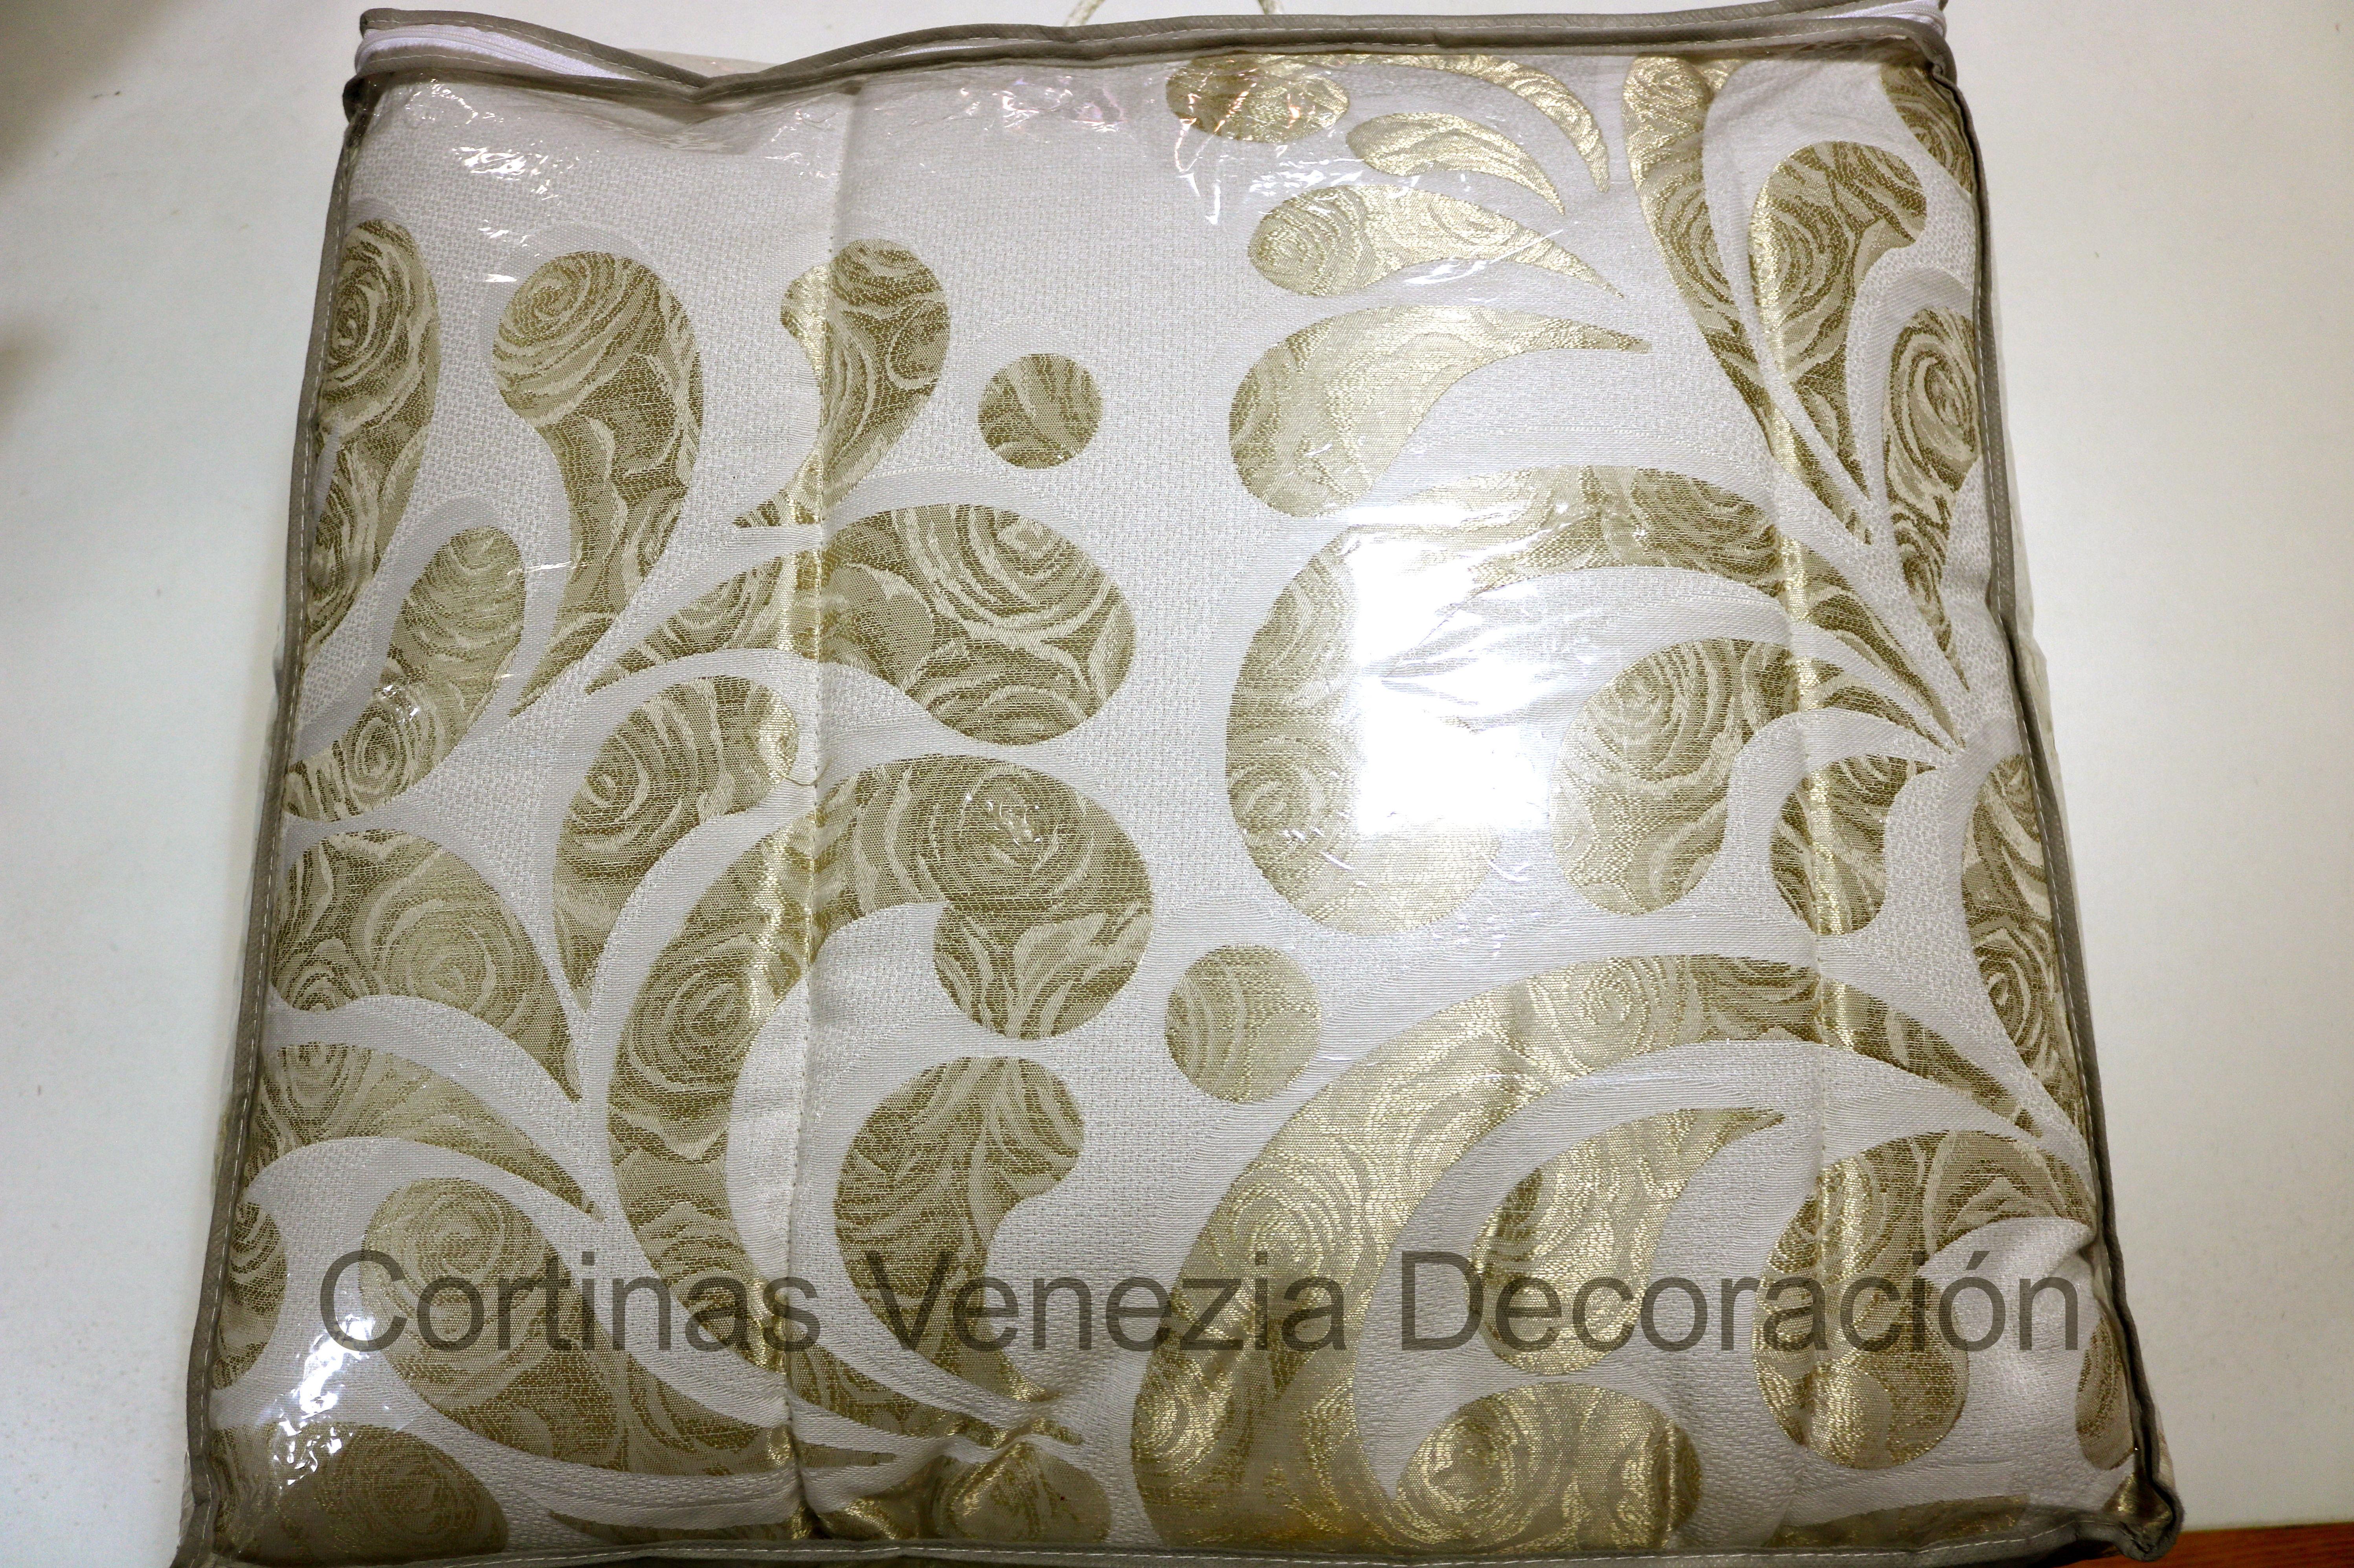 Austral Beige: Catálogo de Venezia Decoración